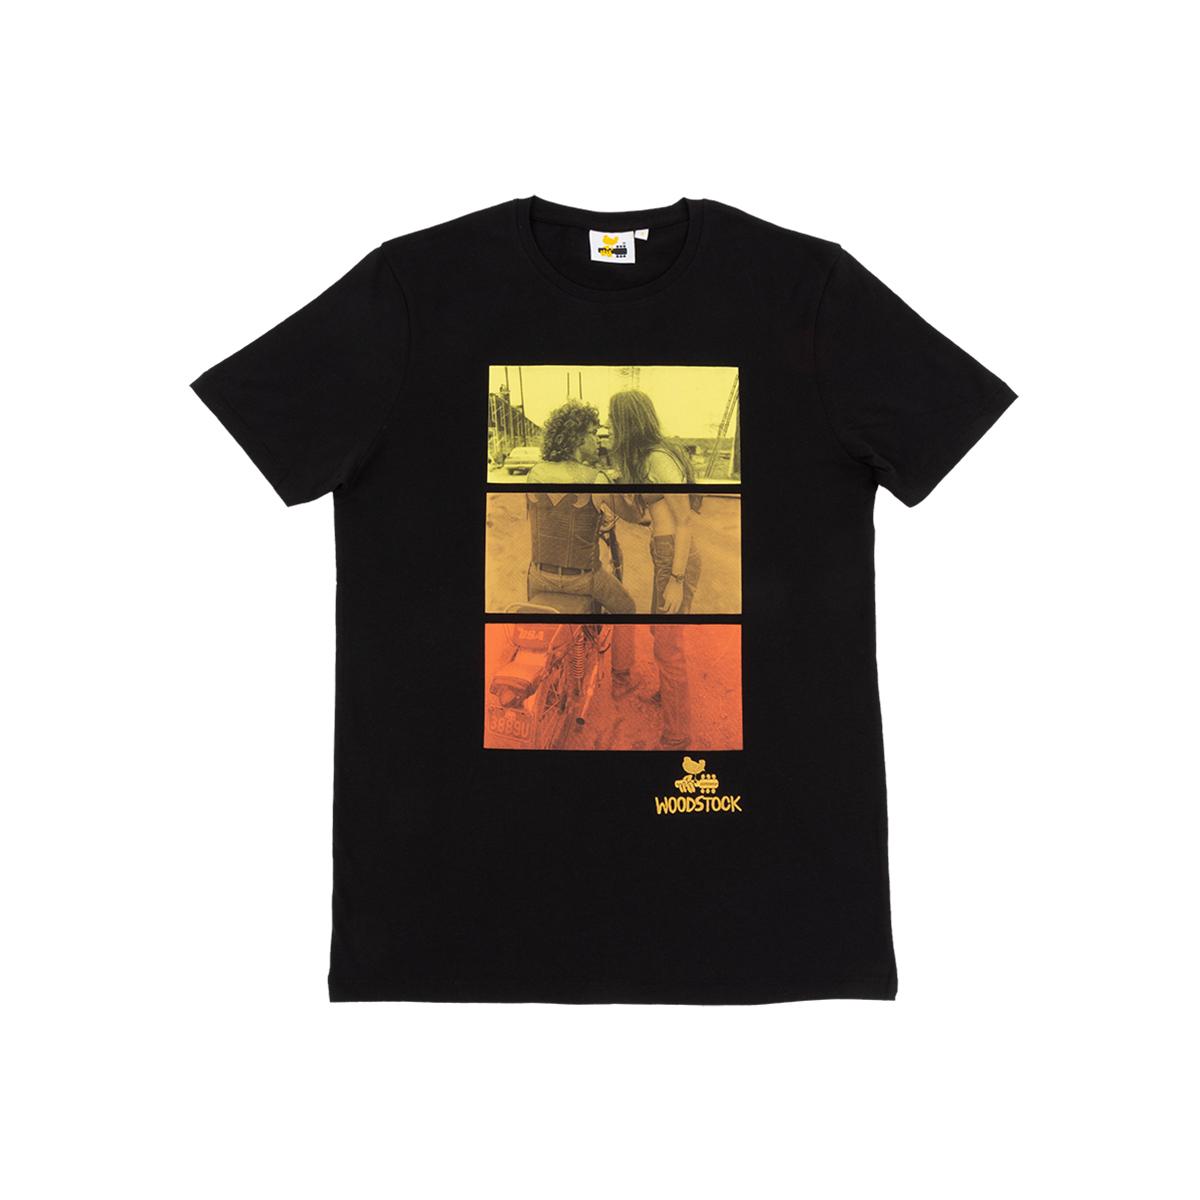 Woodstock Gradient Motorcycle Couple T-shirt